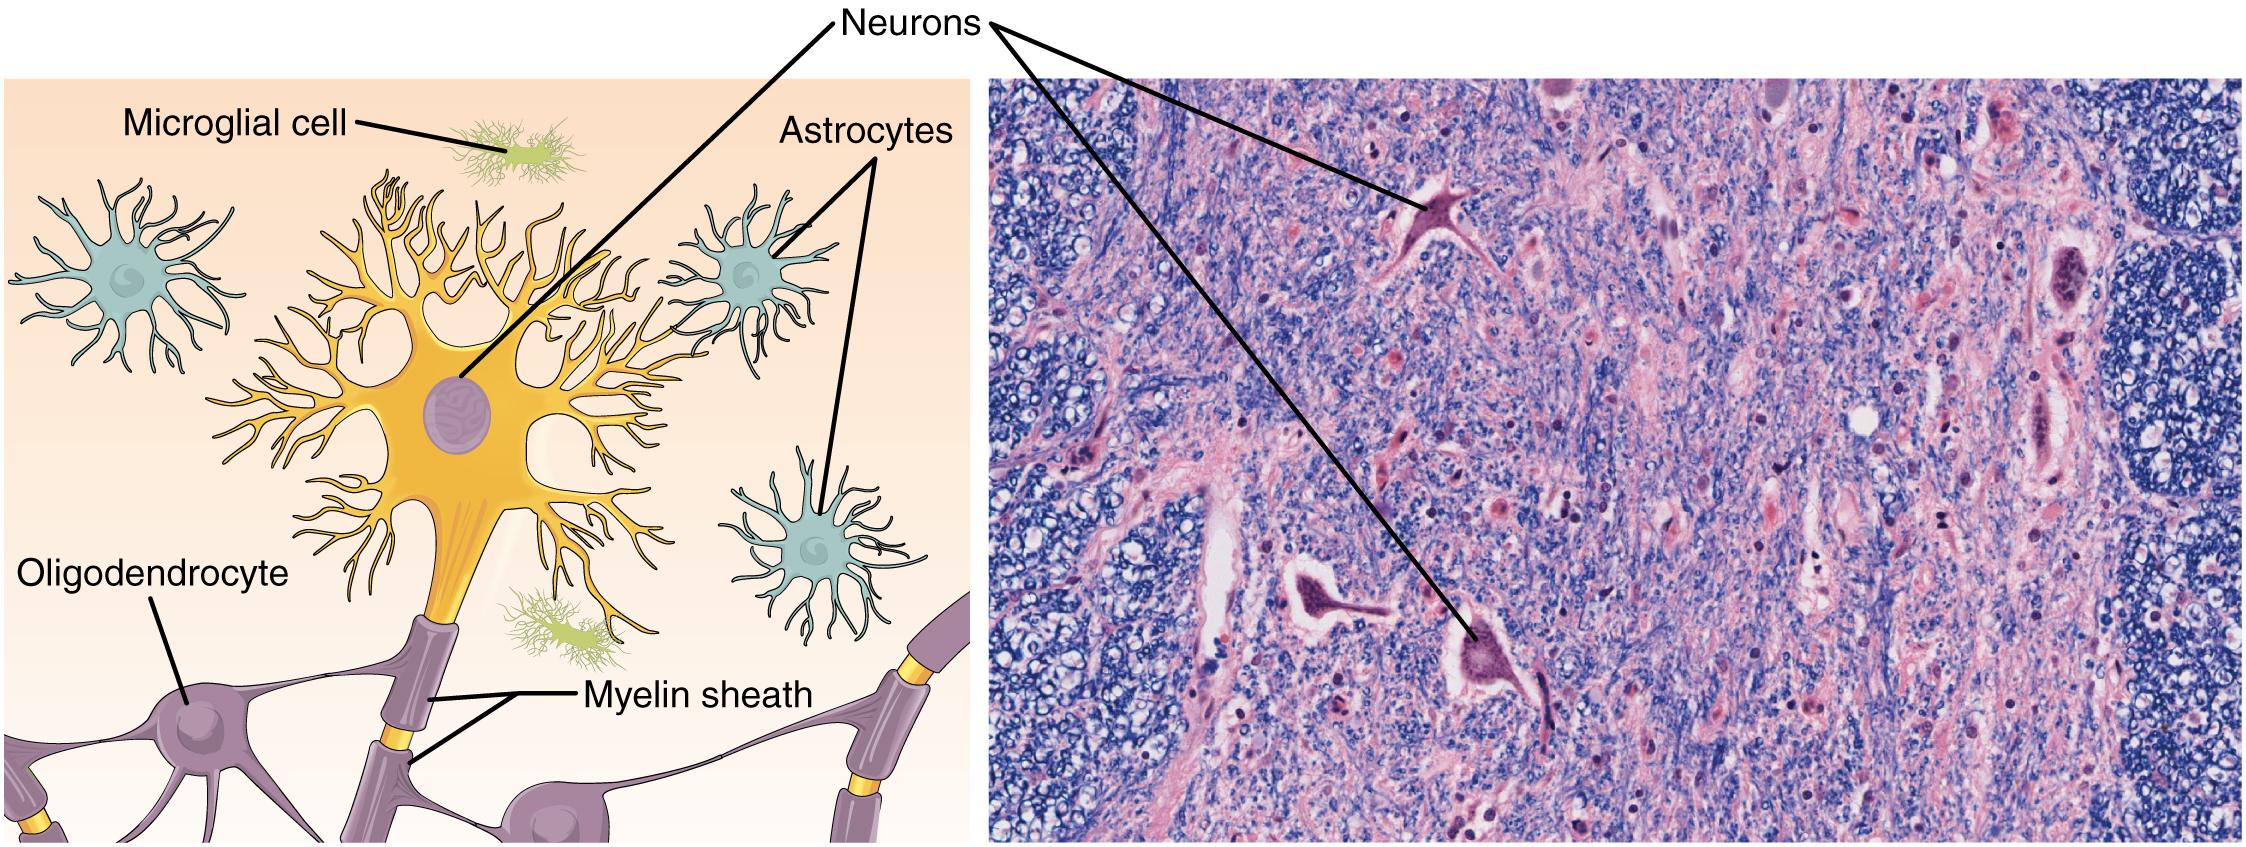 Nervous Tissue Mediates Perception And Response Anatomy